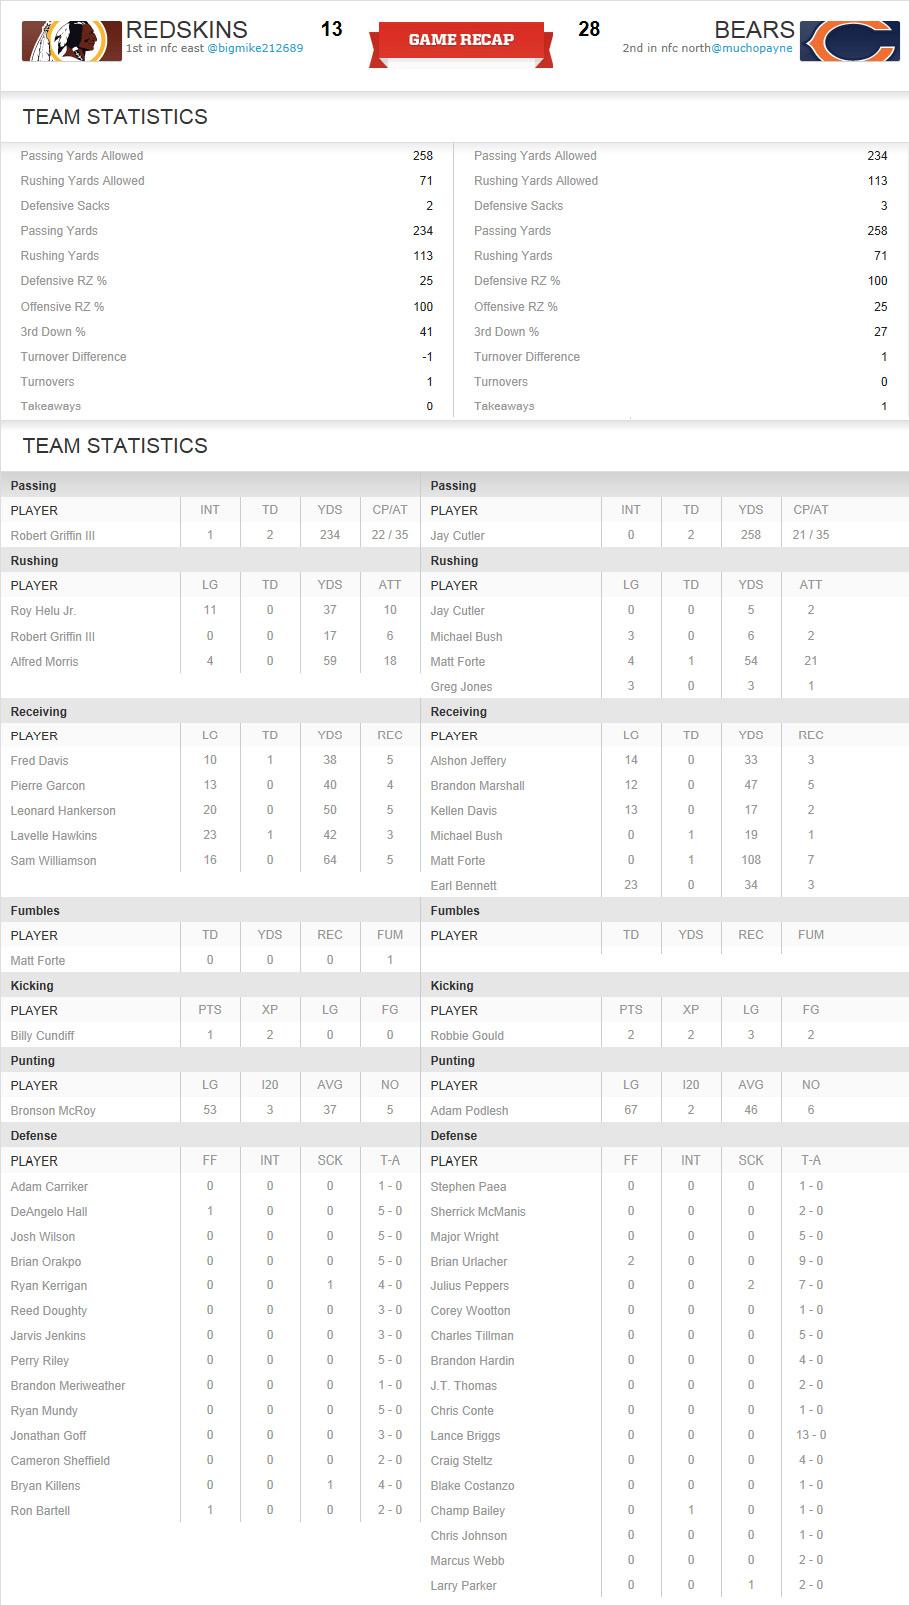 Washington Redskins vs Chicago Bears: Post Game Stats